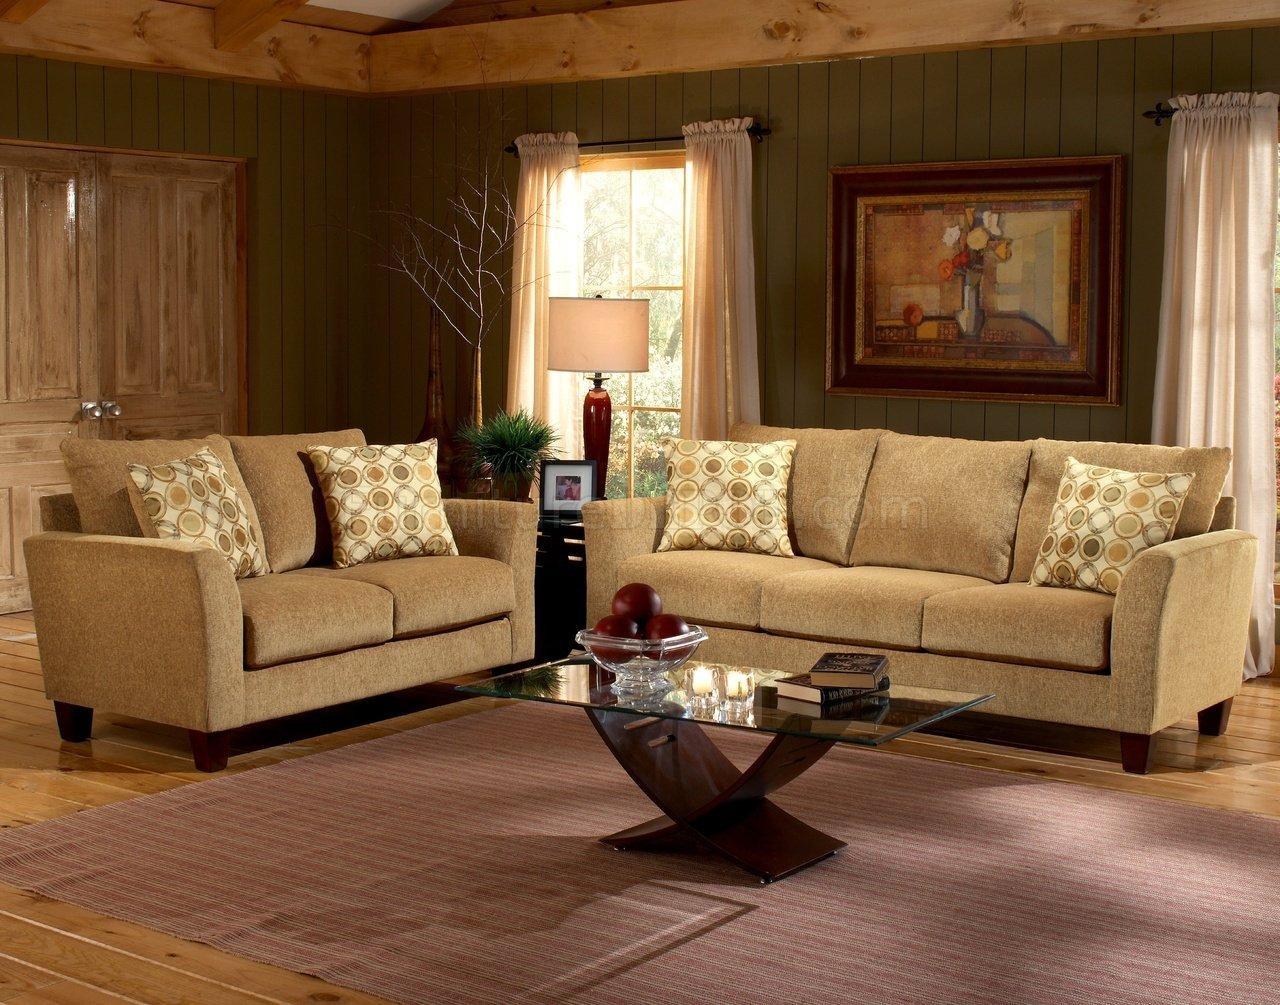 Camel Color Living Room Furniture – Carameloffers Inside Camel Color Sofas (Image 2 of 20)